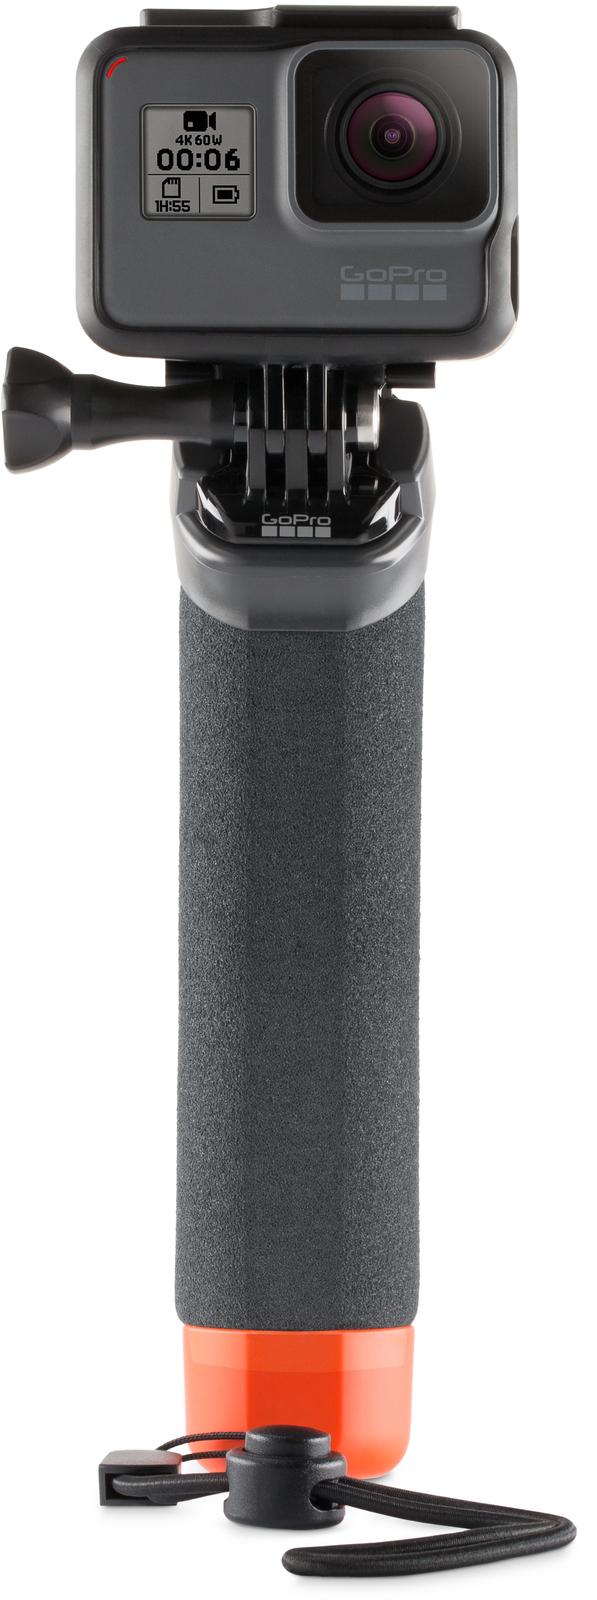 GoPro Handler image